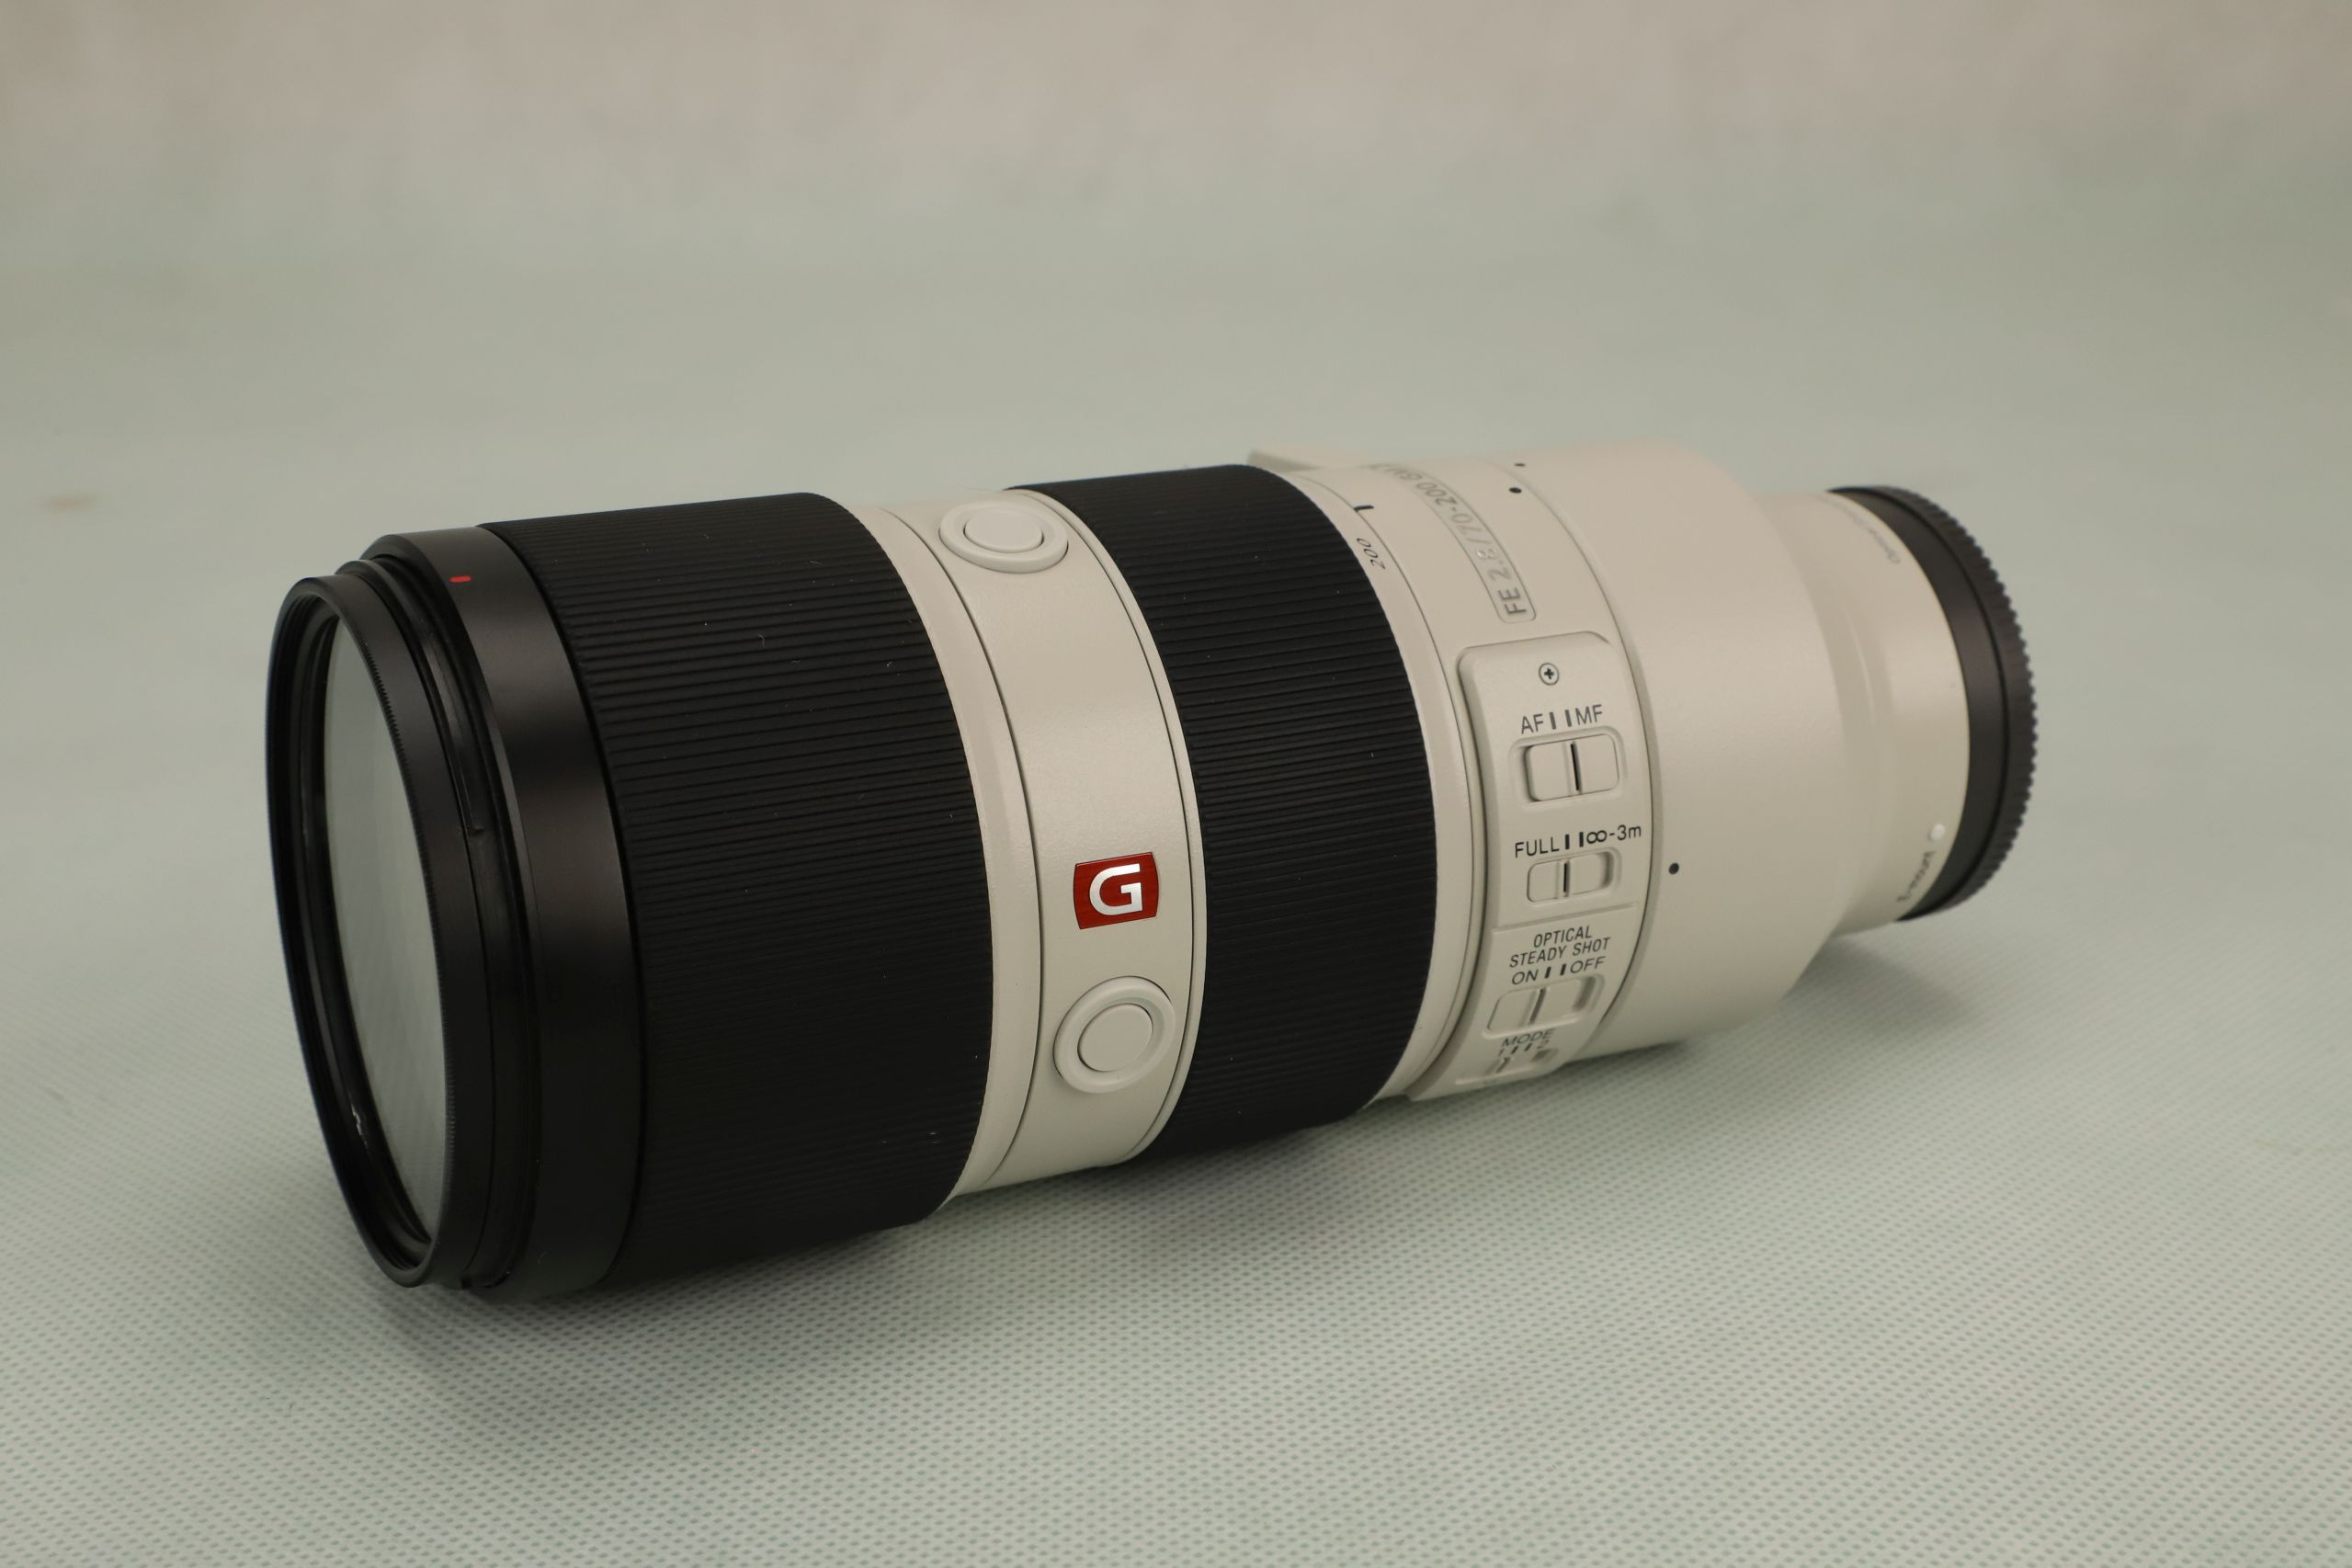 Sony GMaster 70-200 F2.8